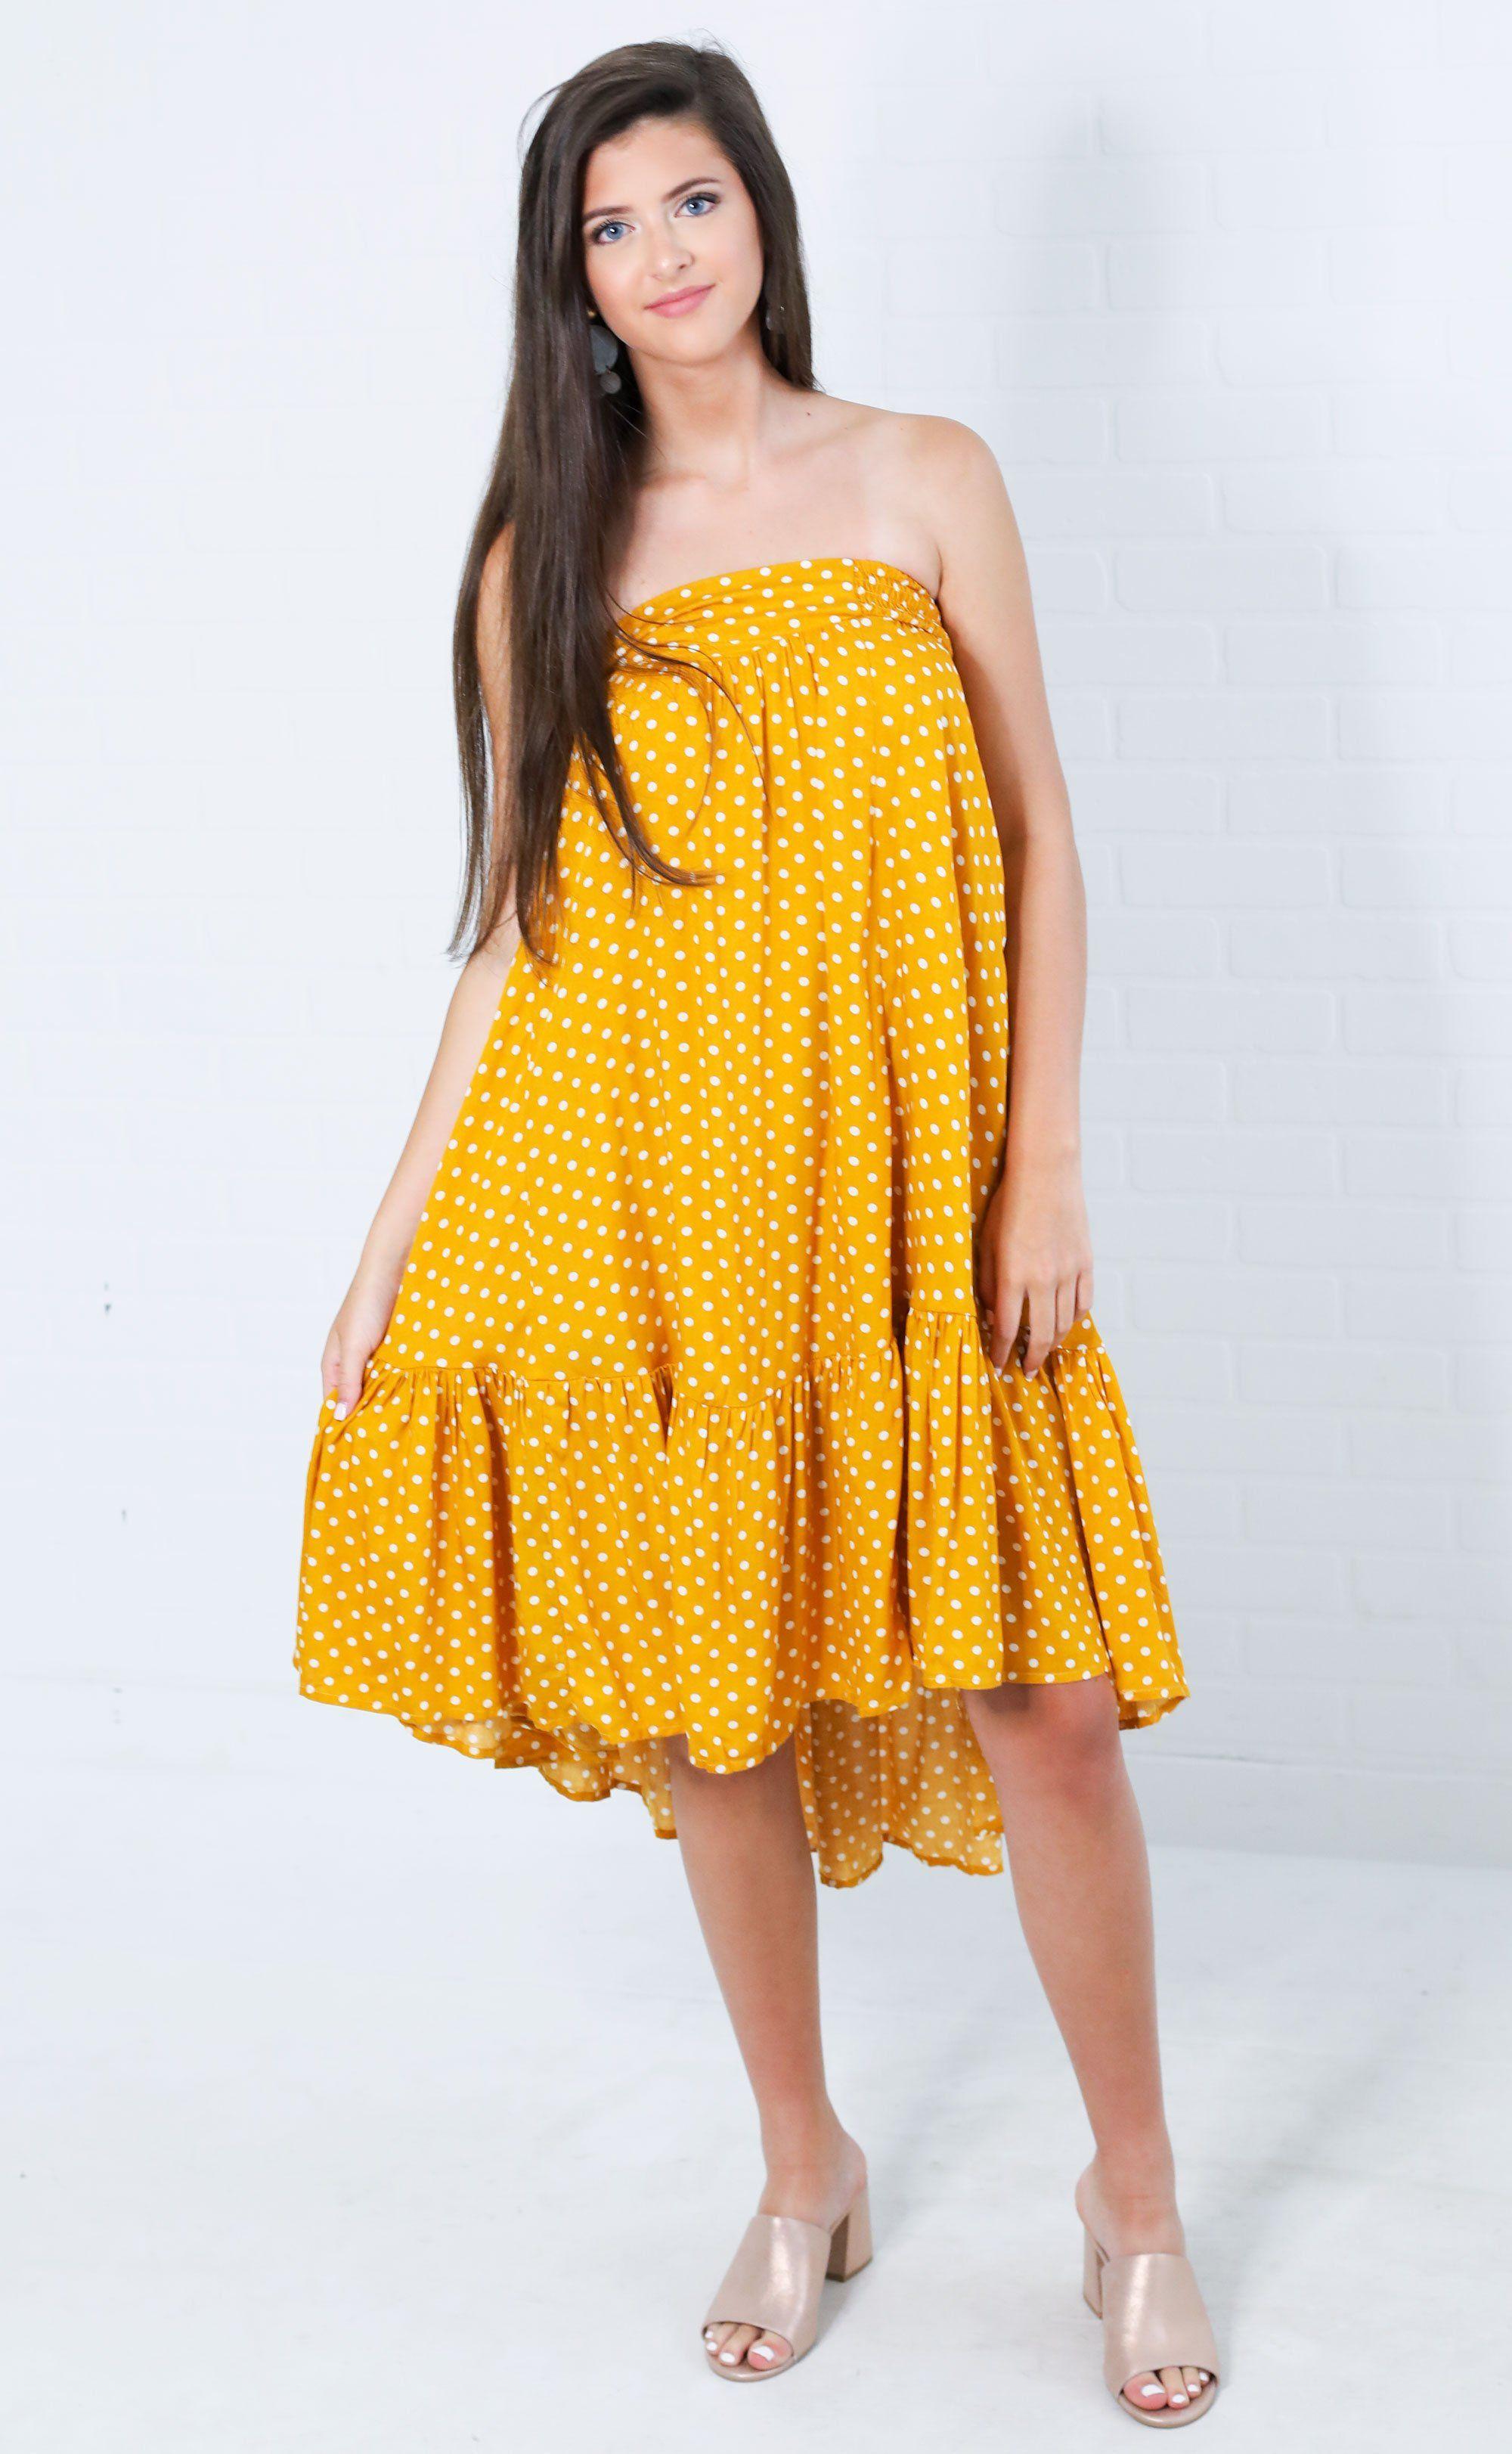 7b2e5cdd51 Time to twirl strapless dress - mustard